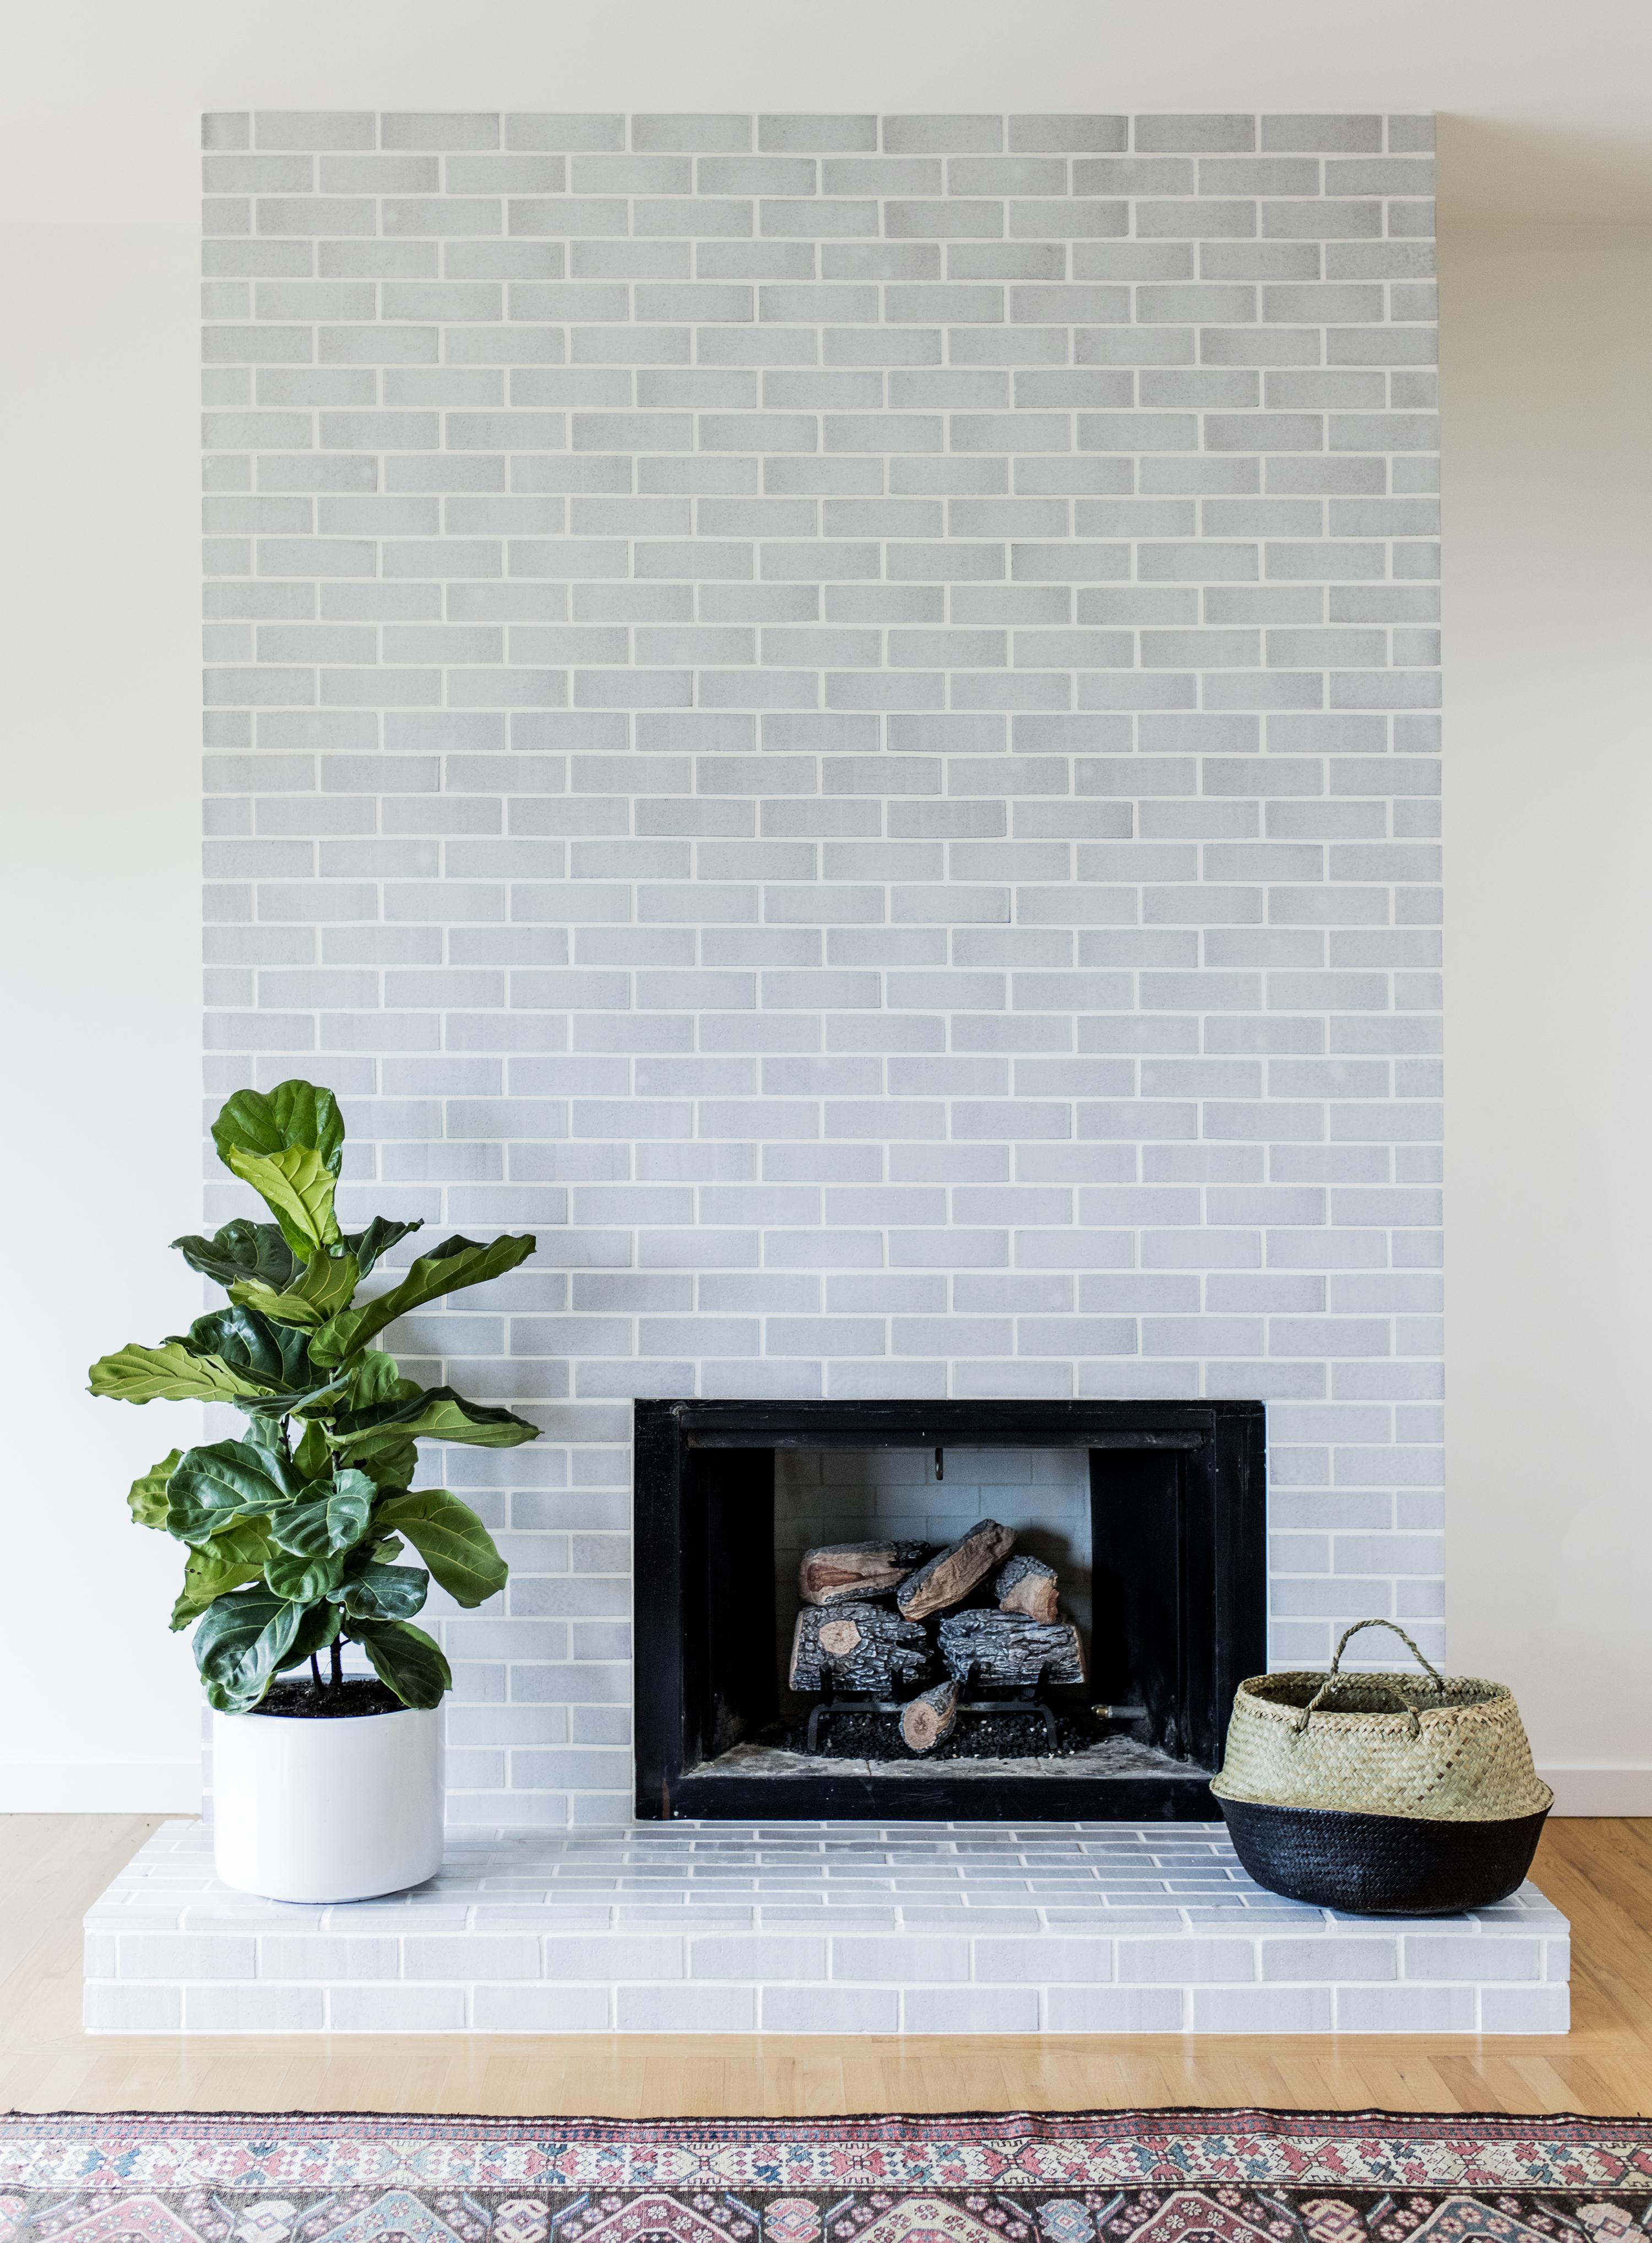 Mid-century modern fireplace surround in Winter Mountains Glazed Thin Brick